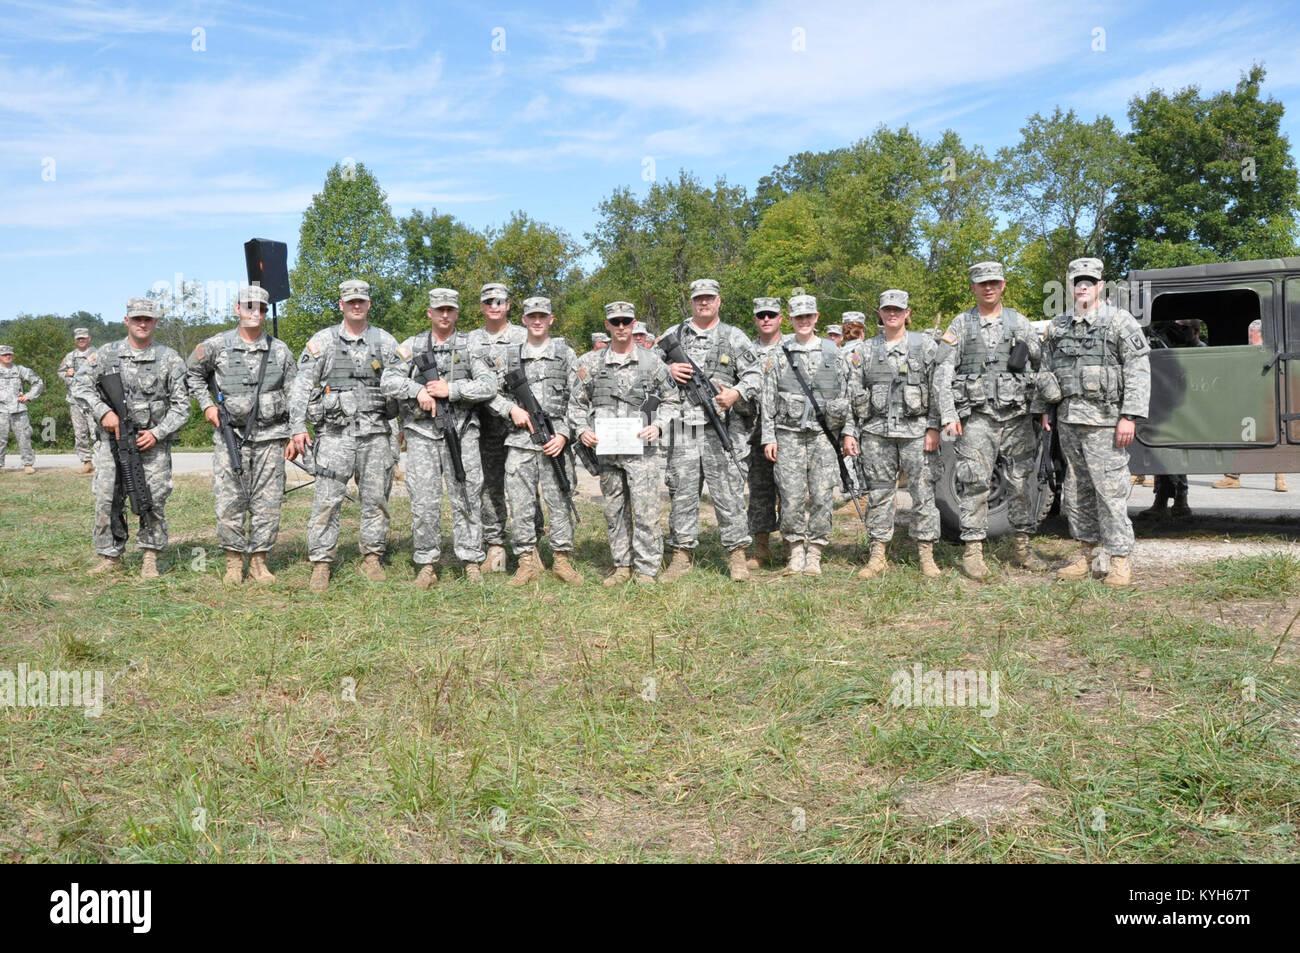 The Kentucky National Guard's 63rd Theater Aviation Brigade